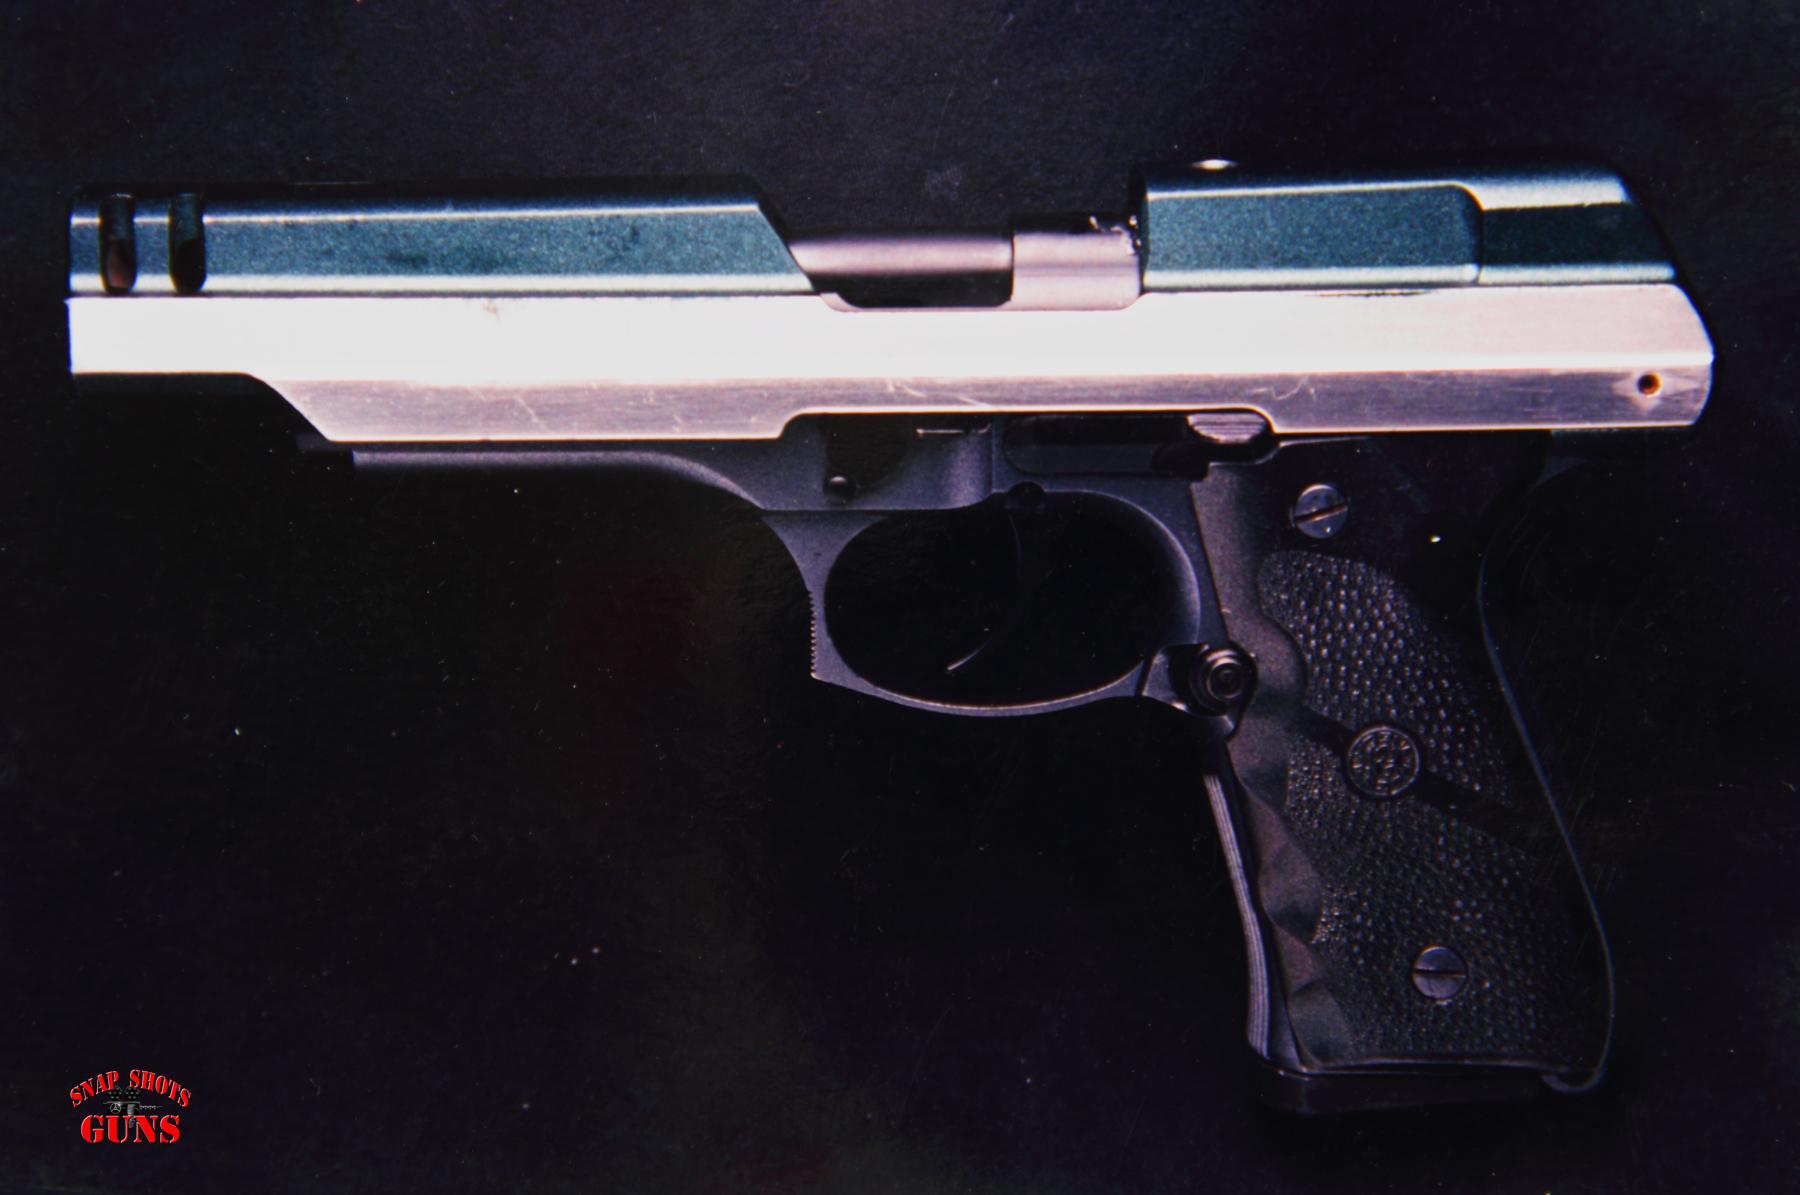 Thug gun